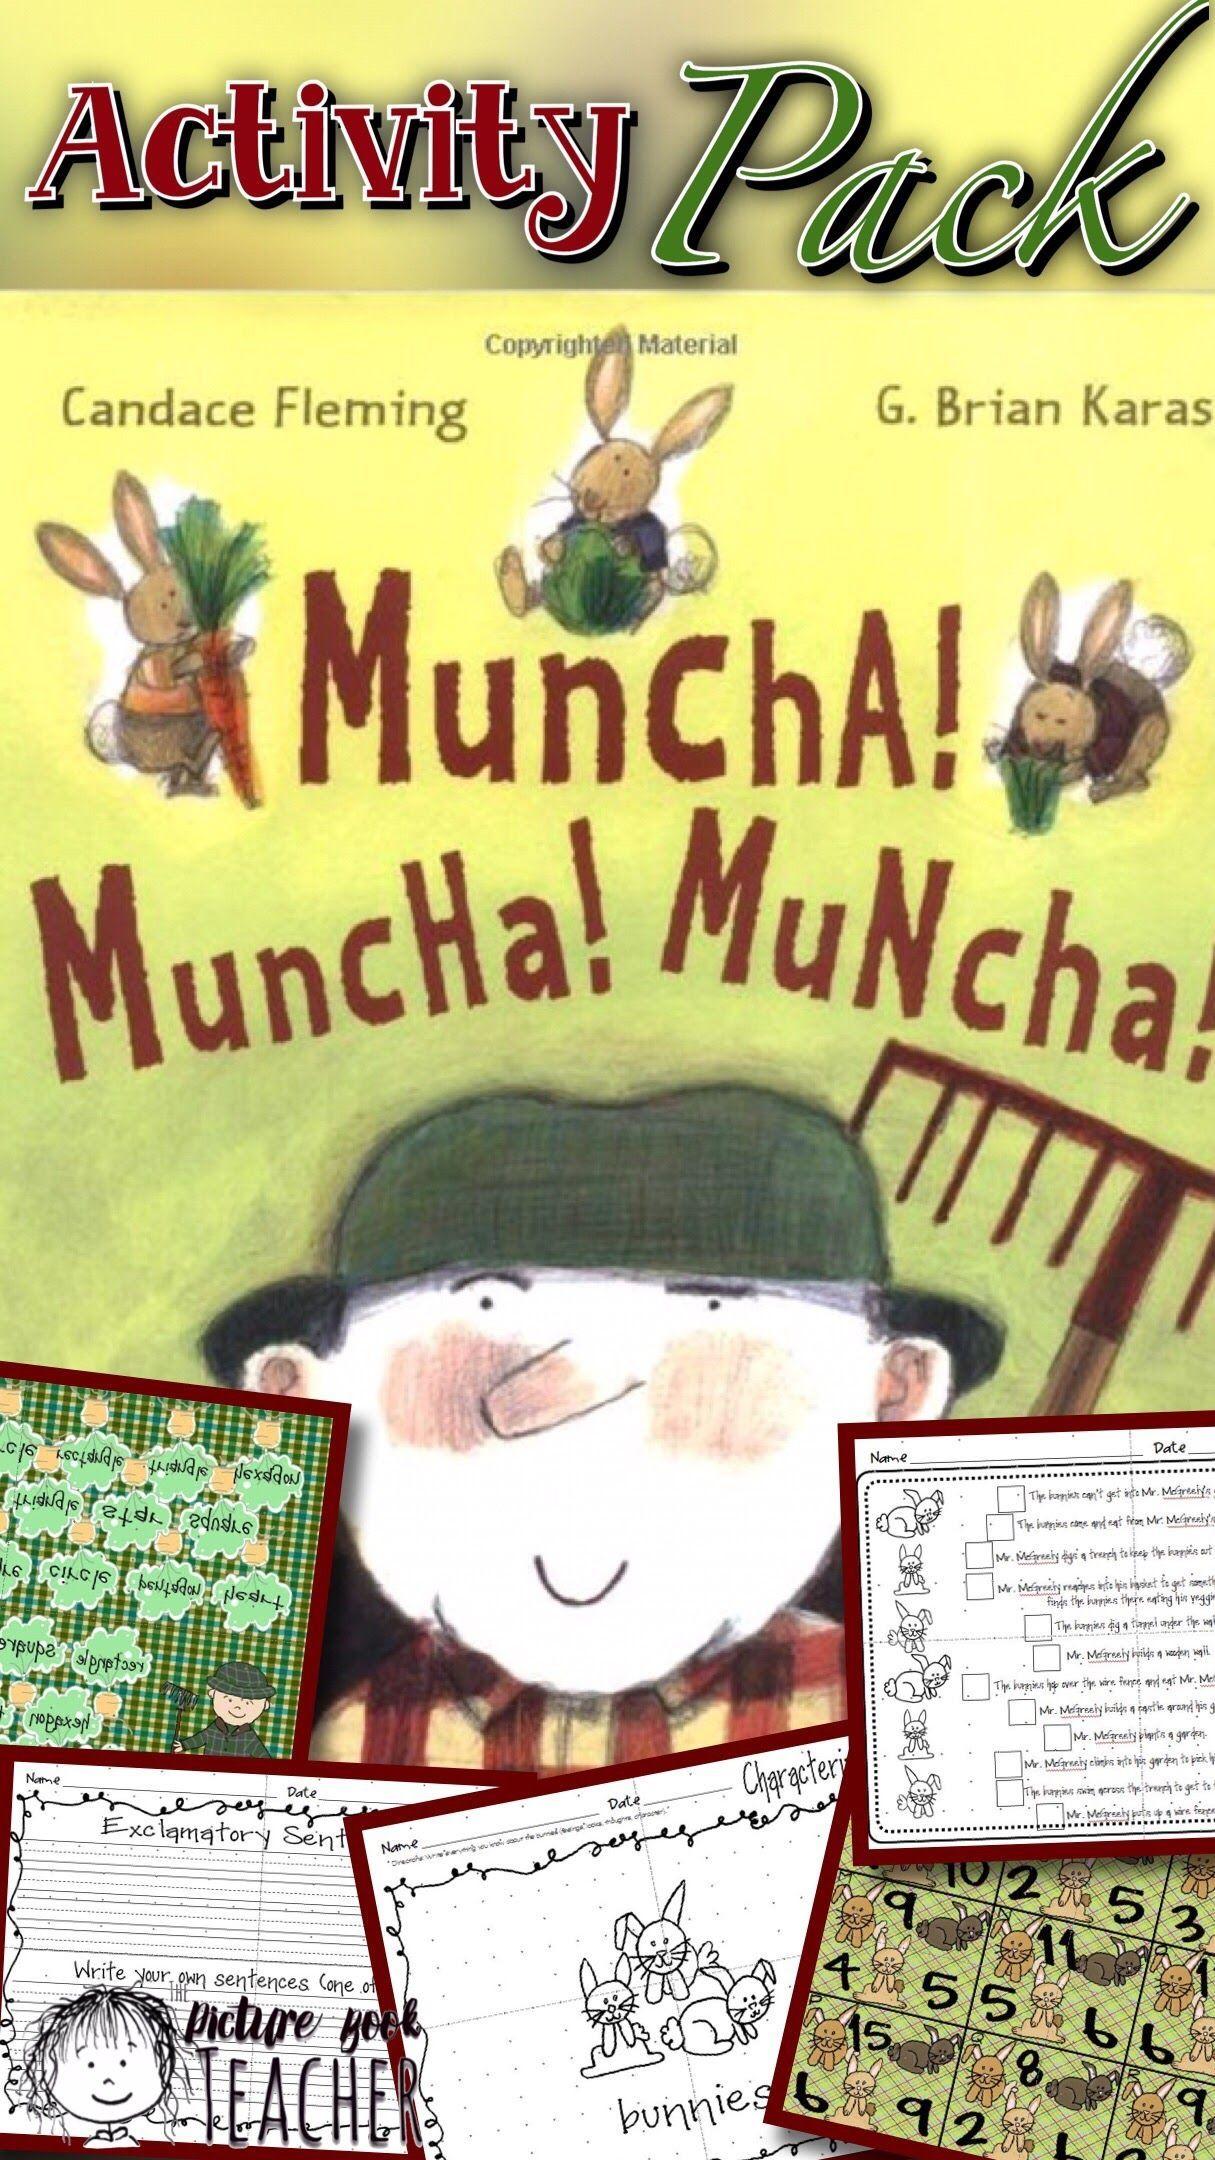 Activity Packet Inspired By Muncha Muncha Muncha By